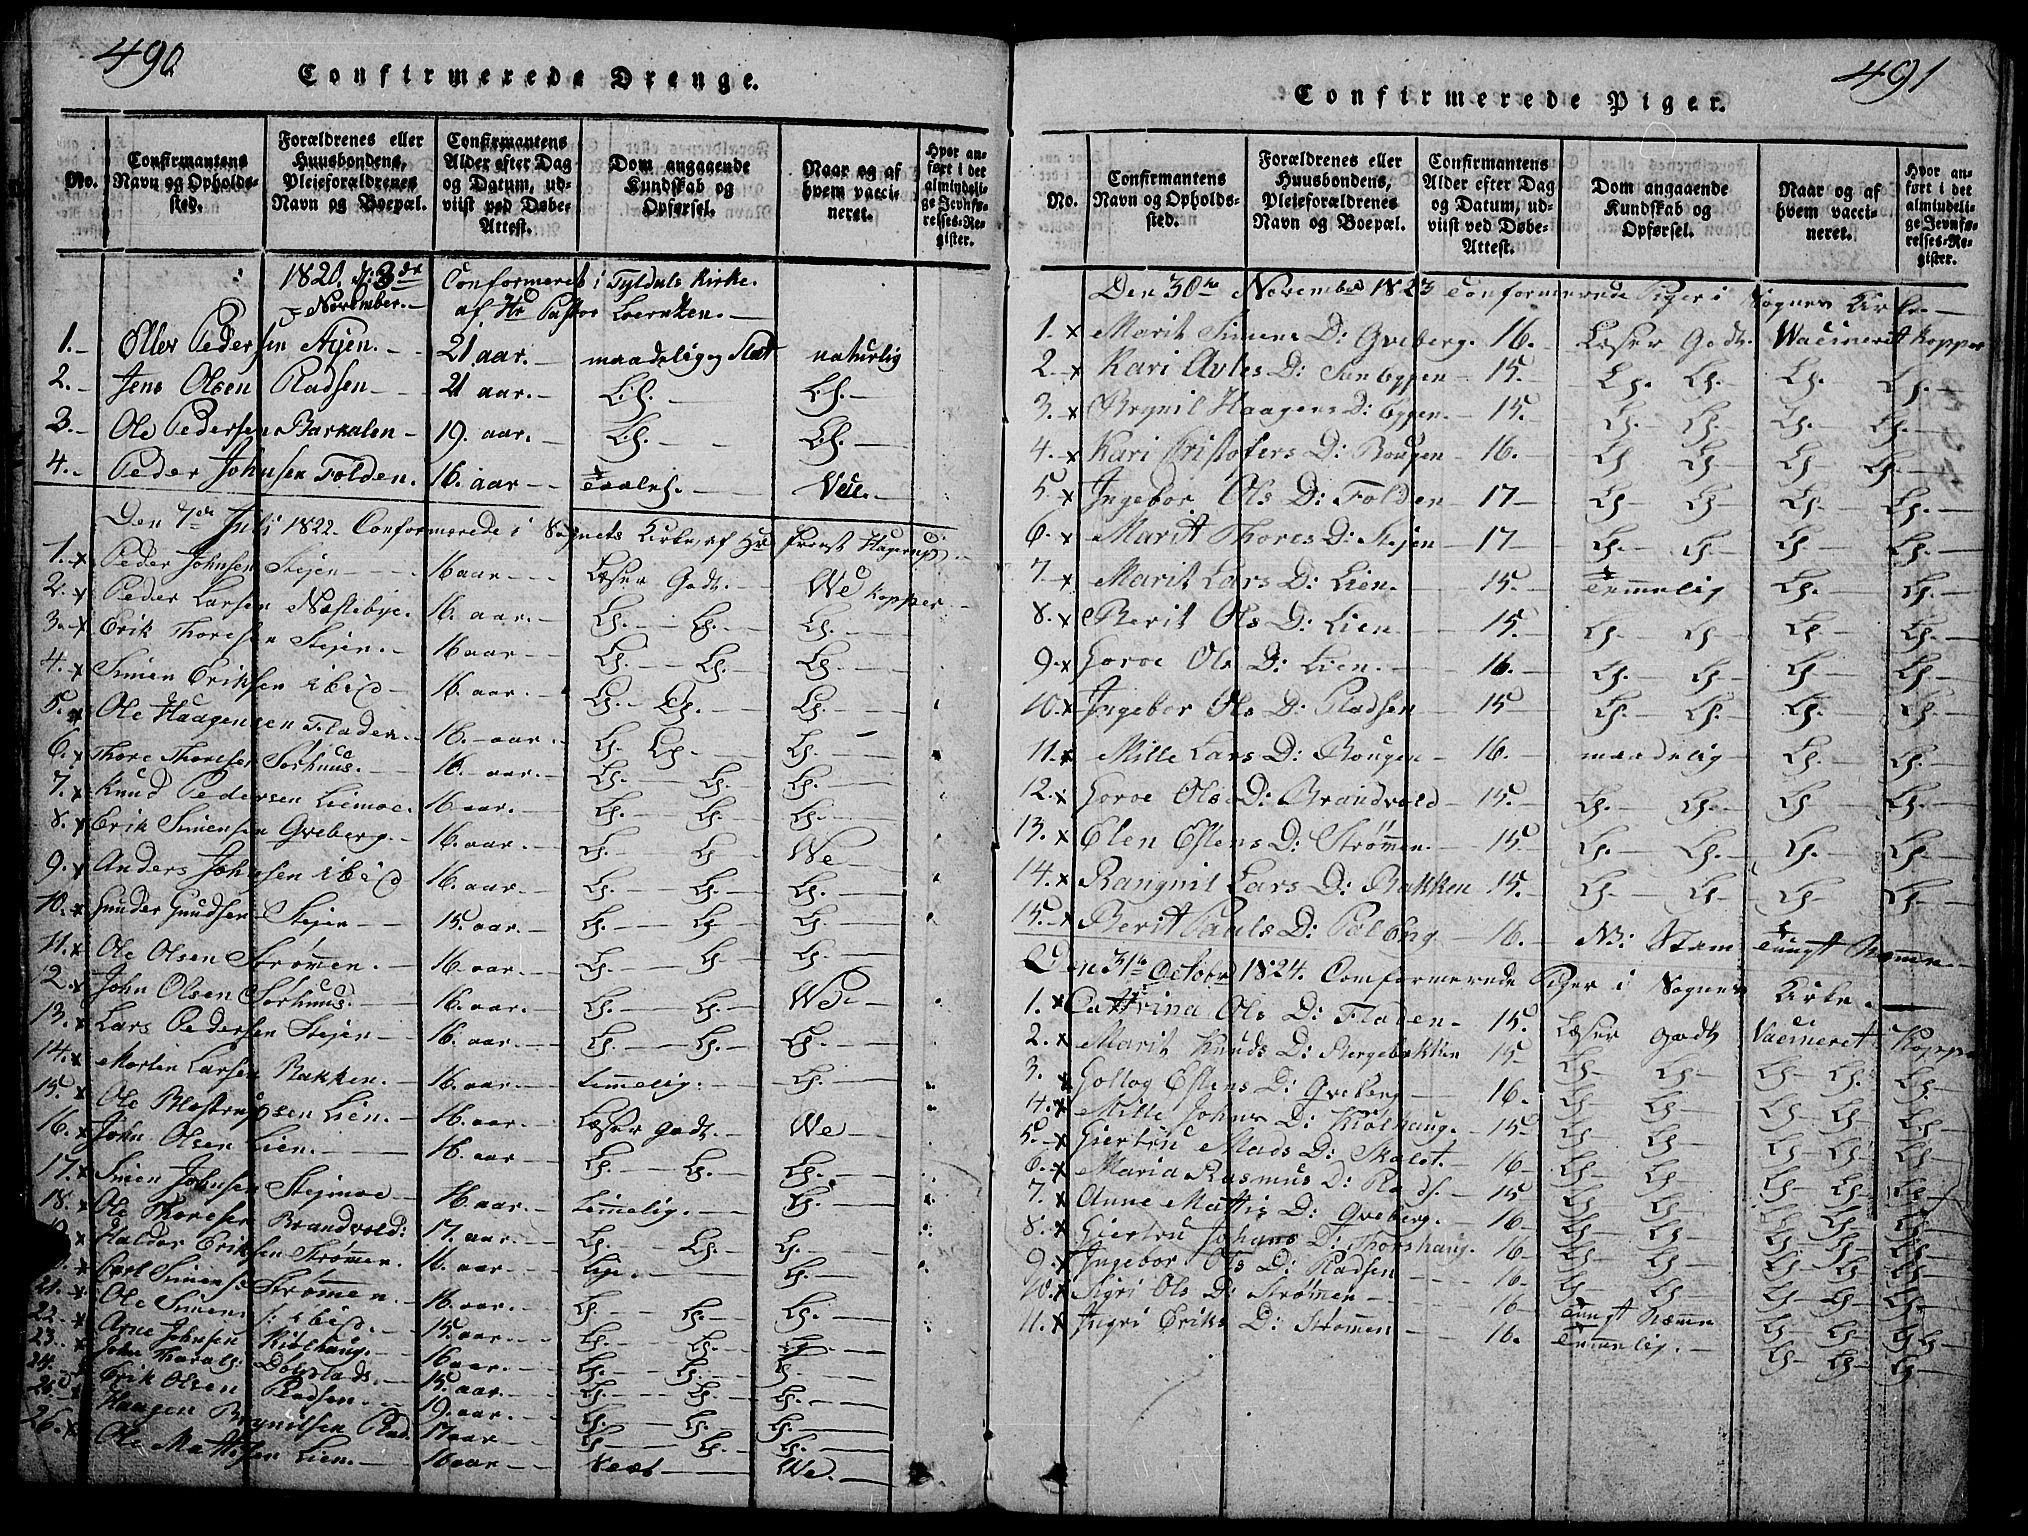 SAH, Tynset prestekontor, Klokkerbok nr. 2, 1814-1862, s. 490-491